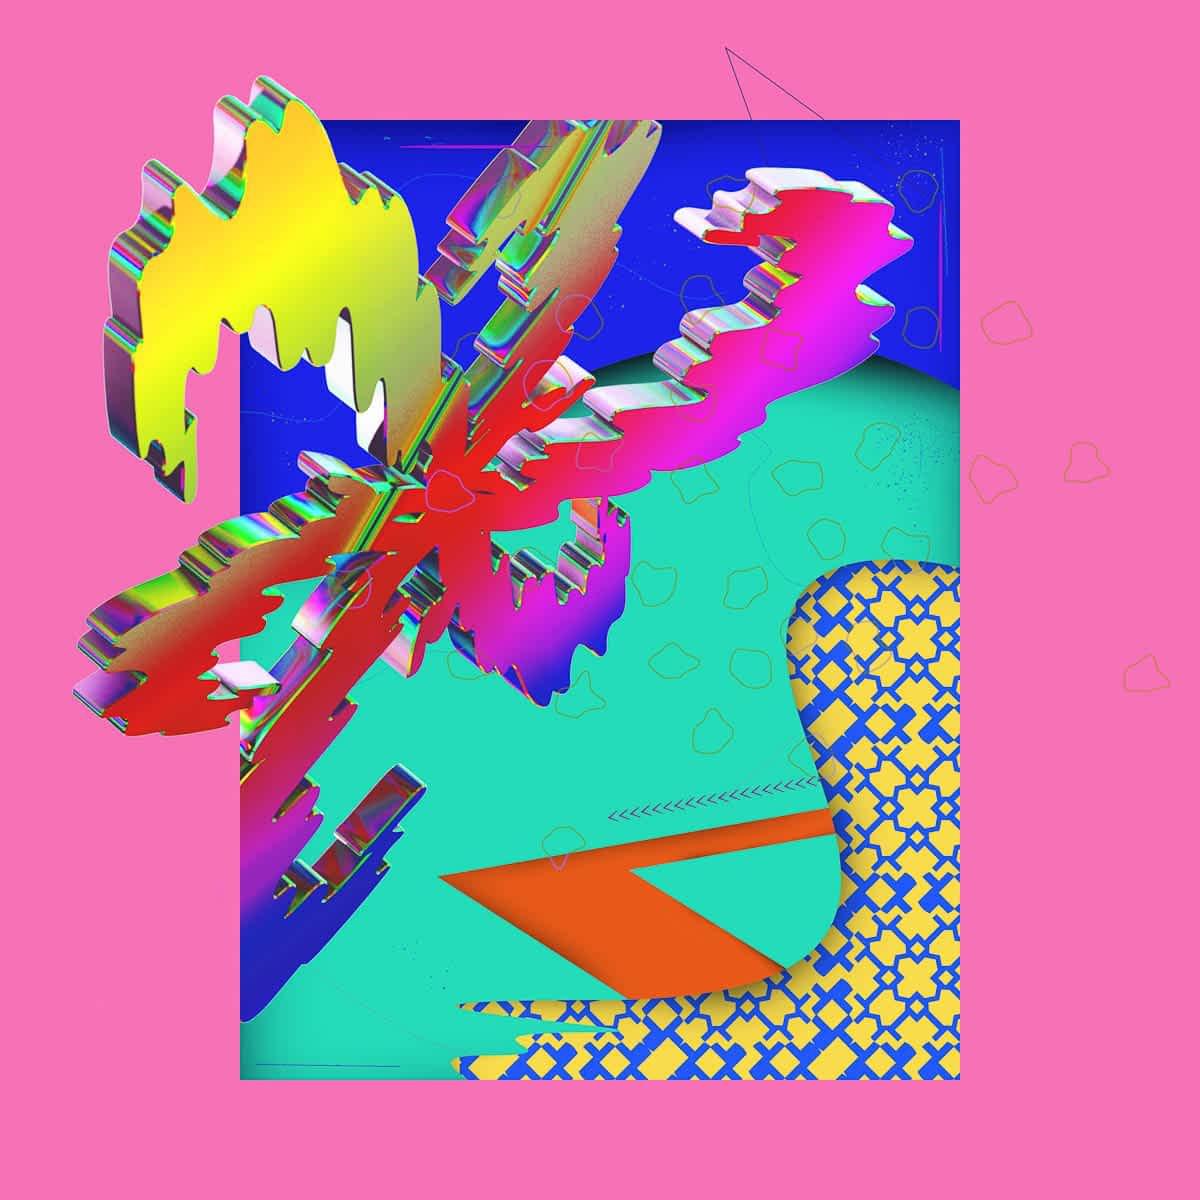 Design 26 – Change The Game